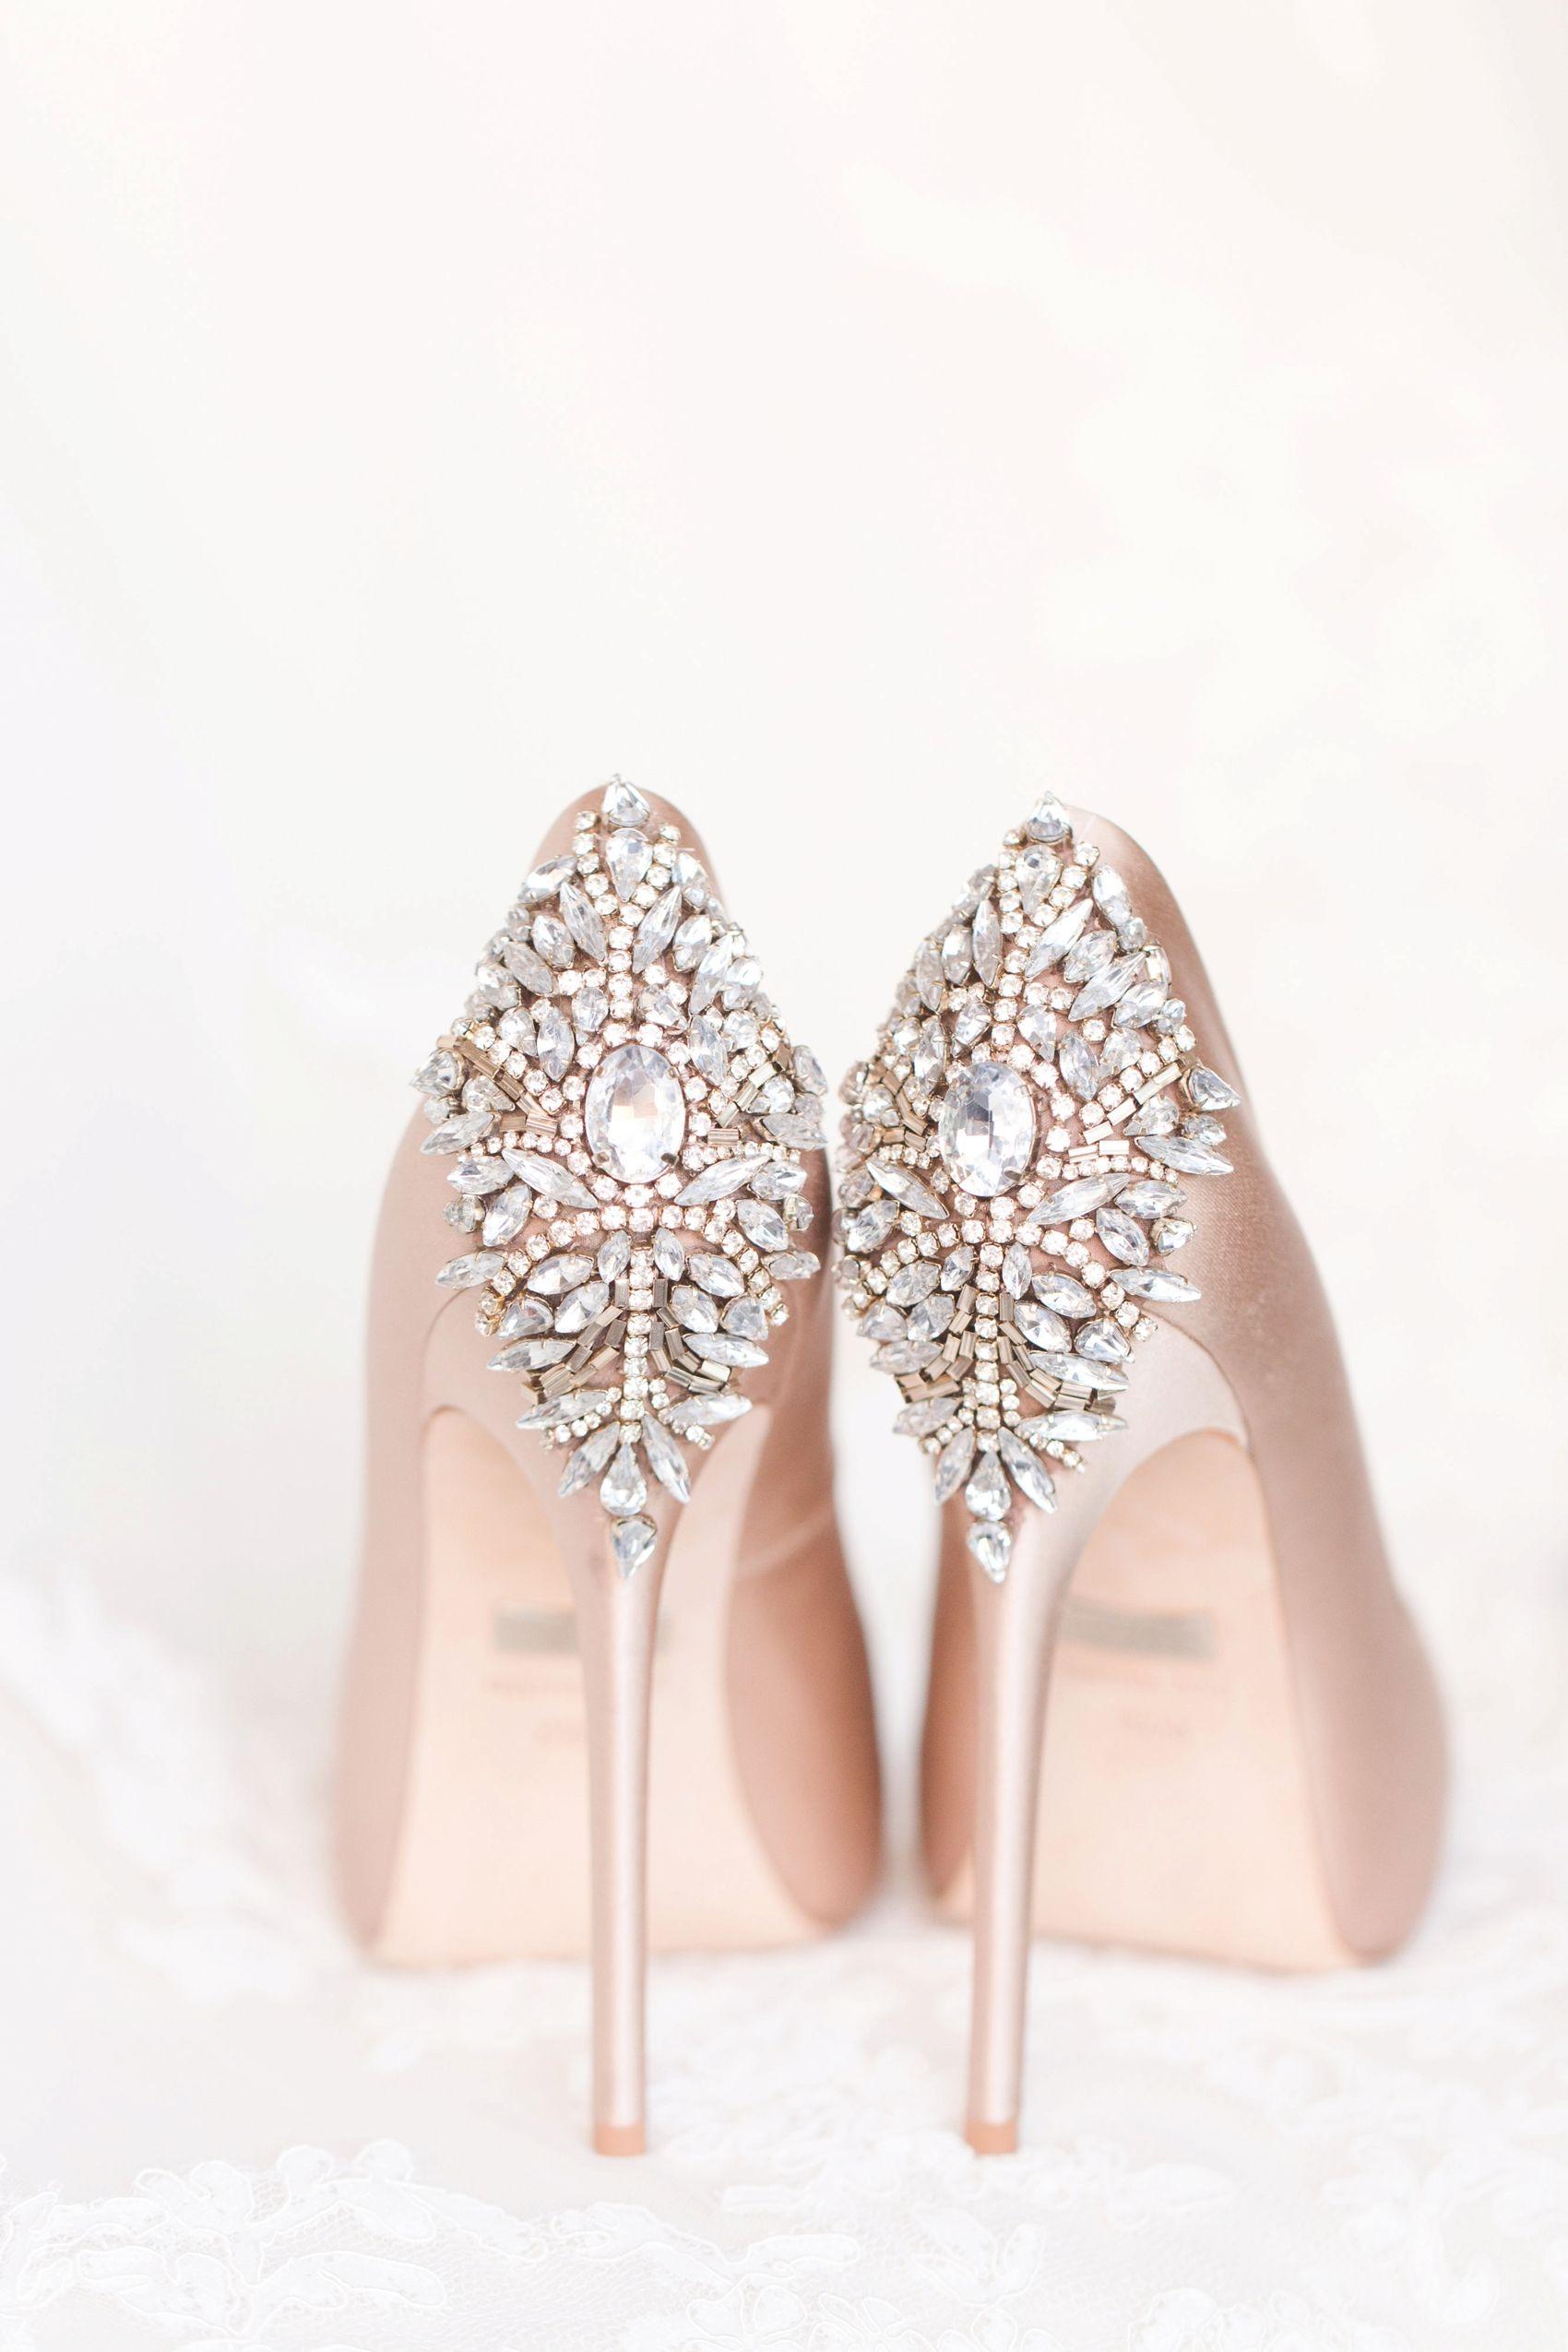 Wedding Workflow (With images) | Wedding shoes, Wedding ...